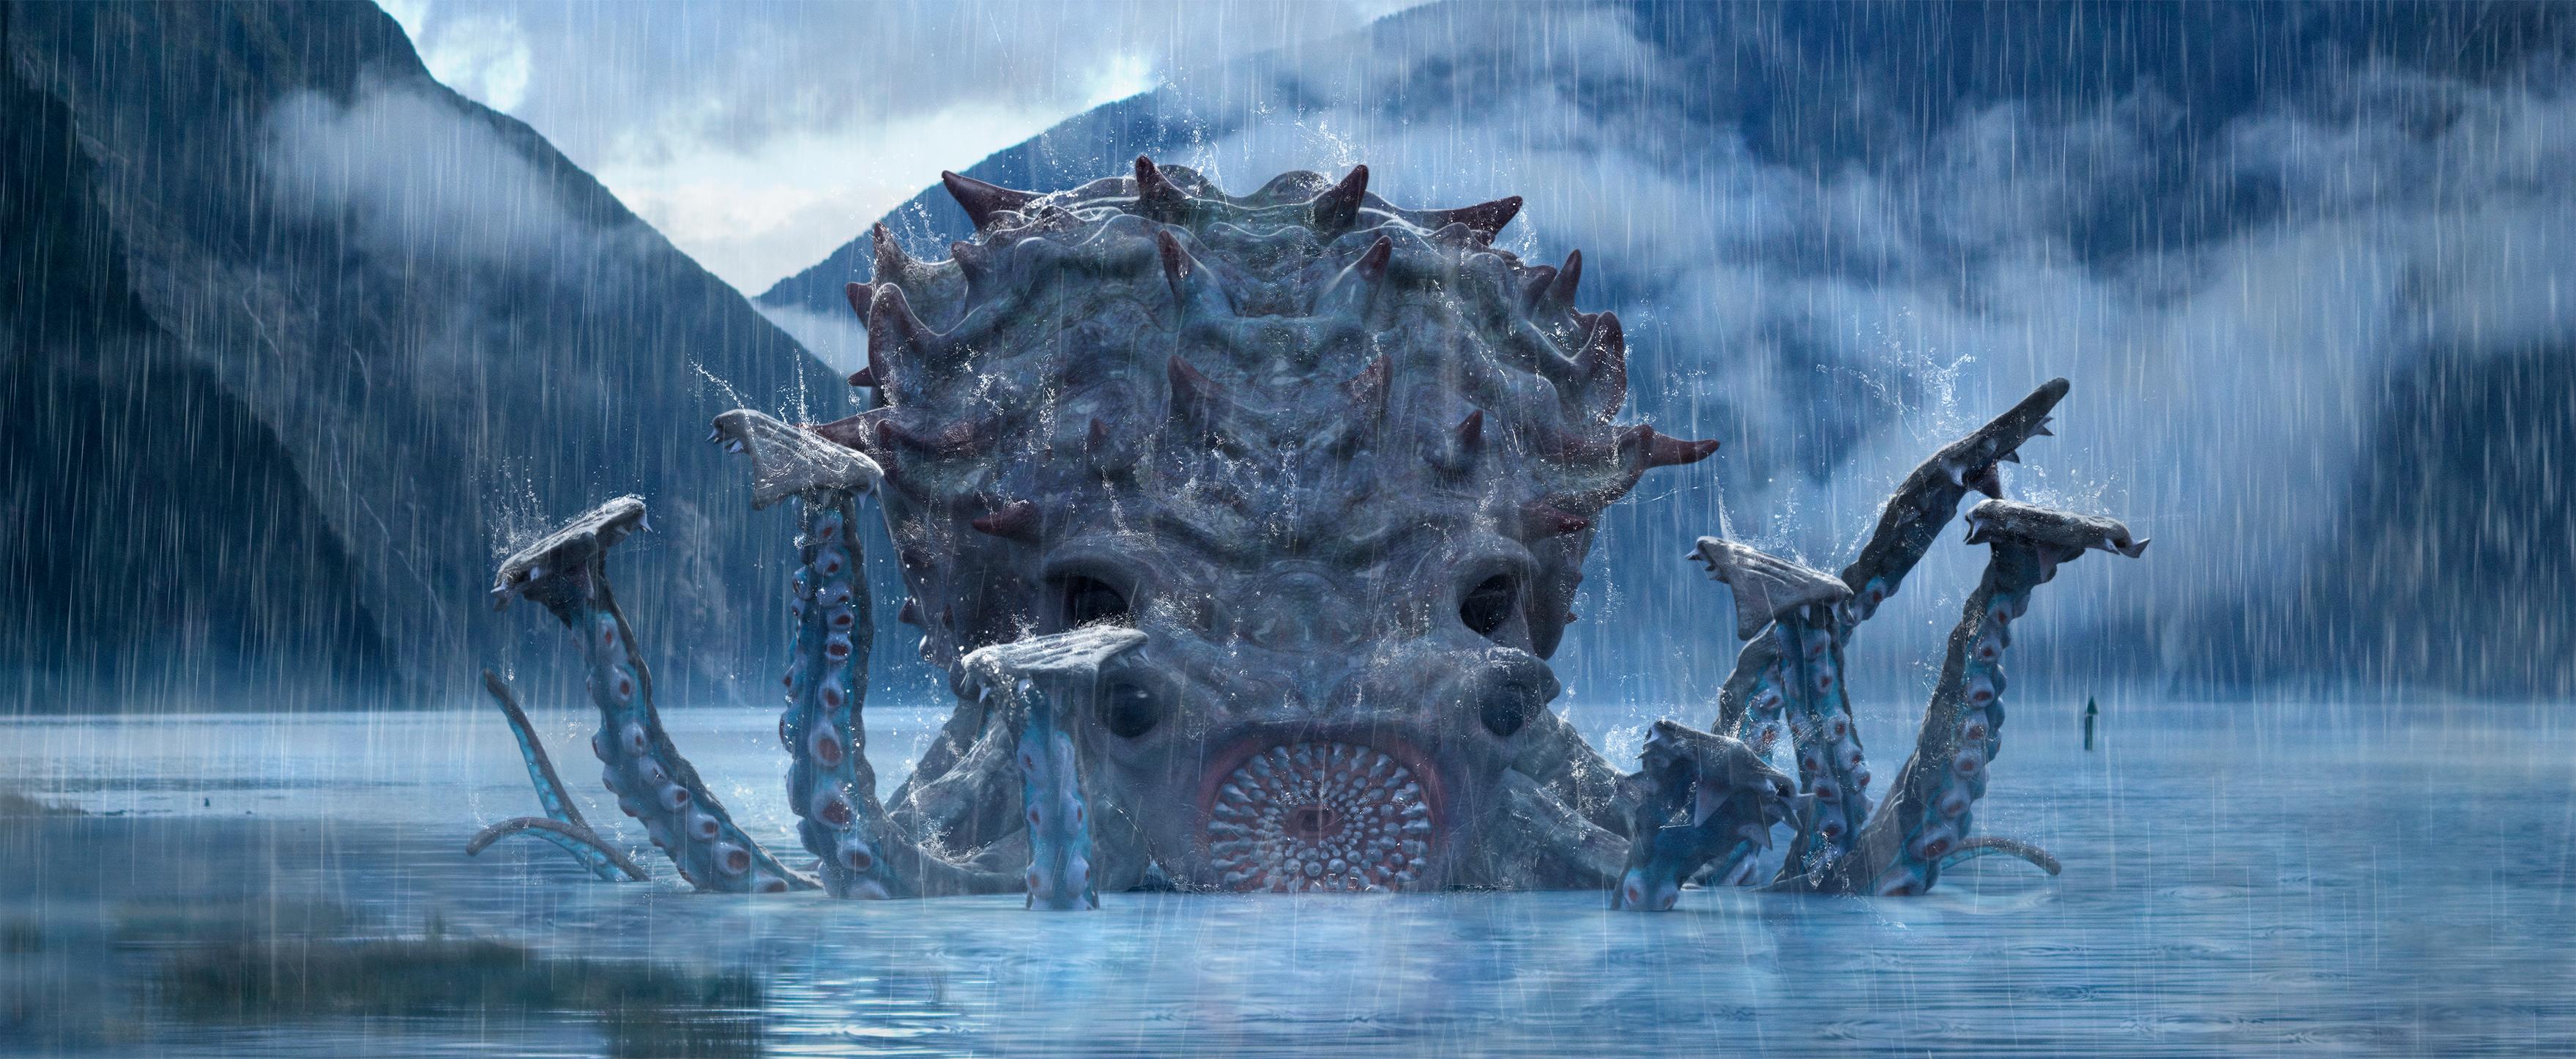 Squid Tropical Storm Concept